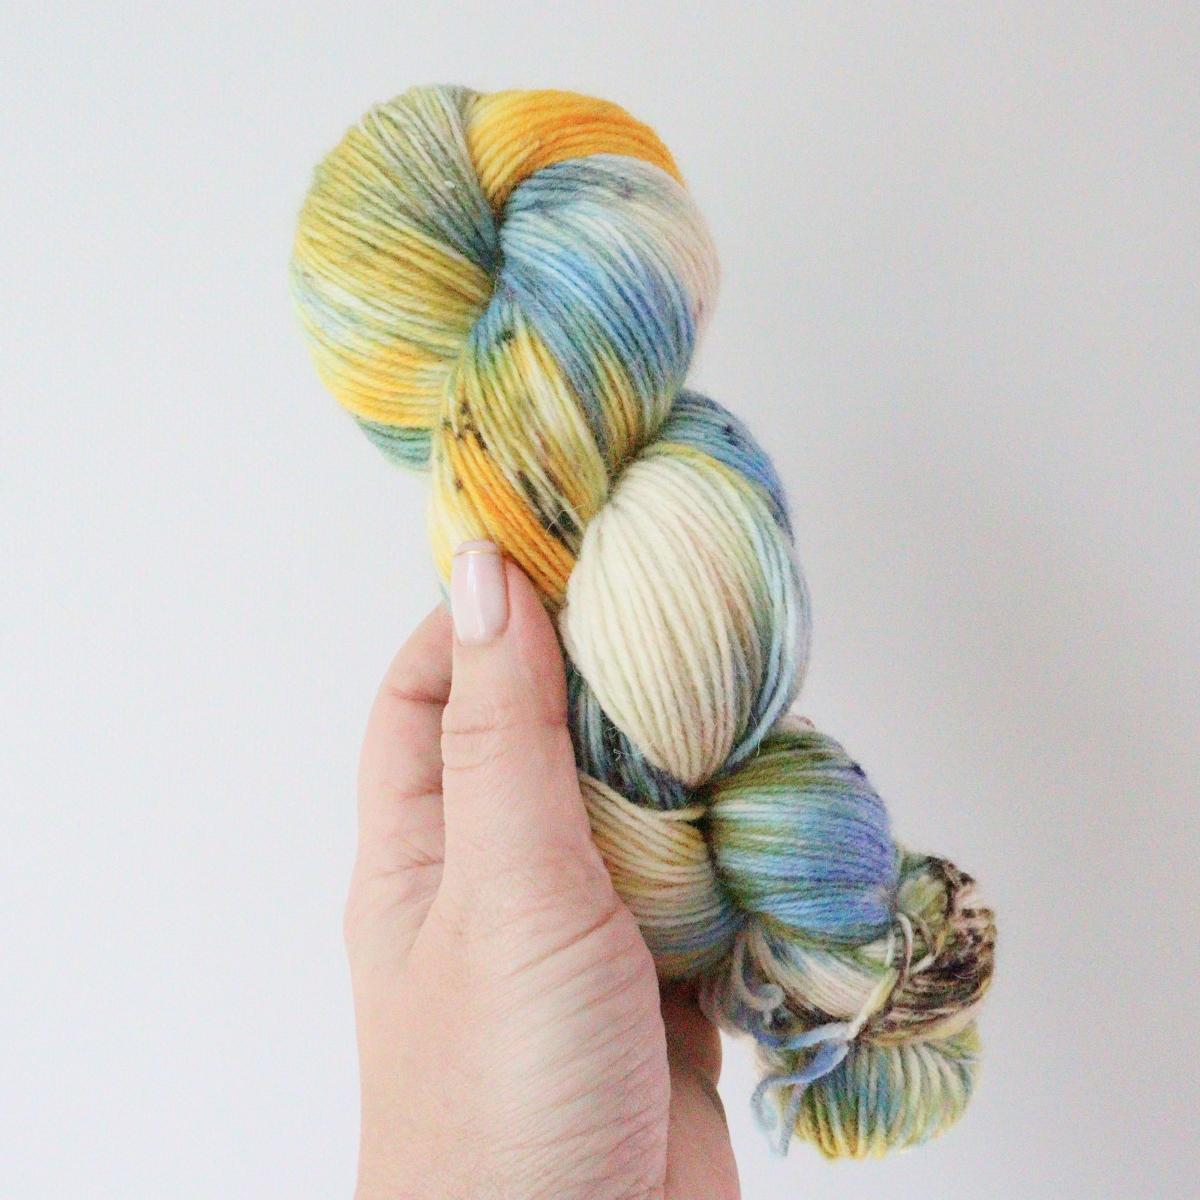 woodico.pro hand dyed yarn 087 6 1200x1200 - Hand dyed yarn / 087